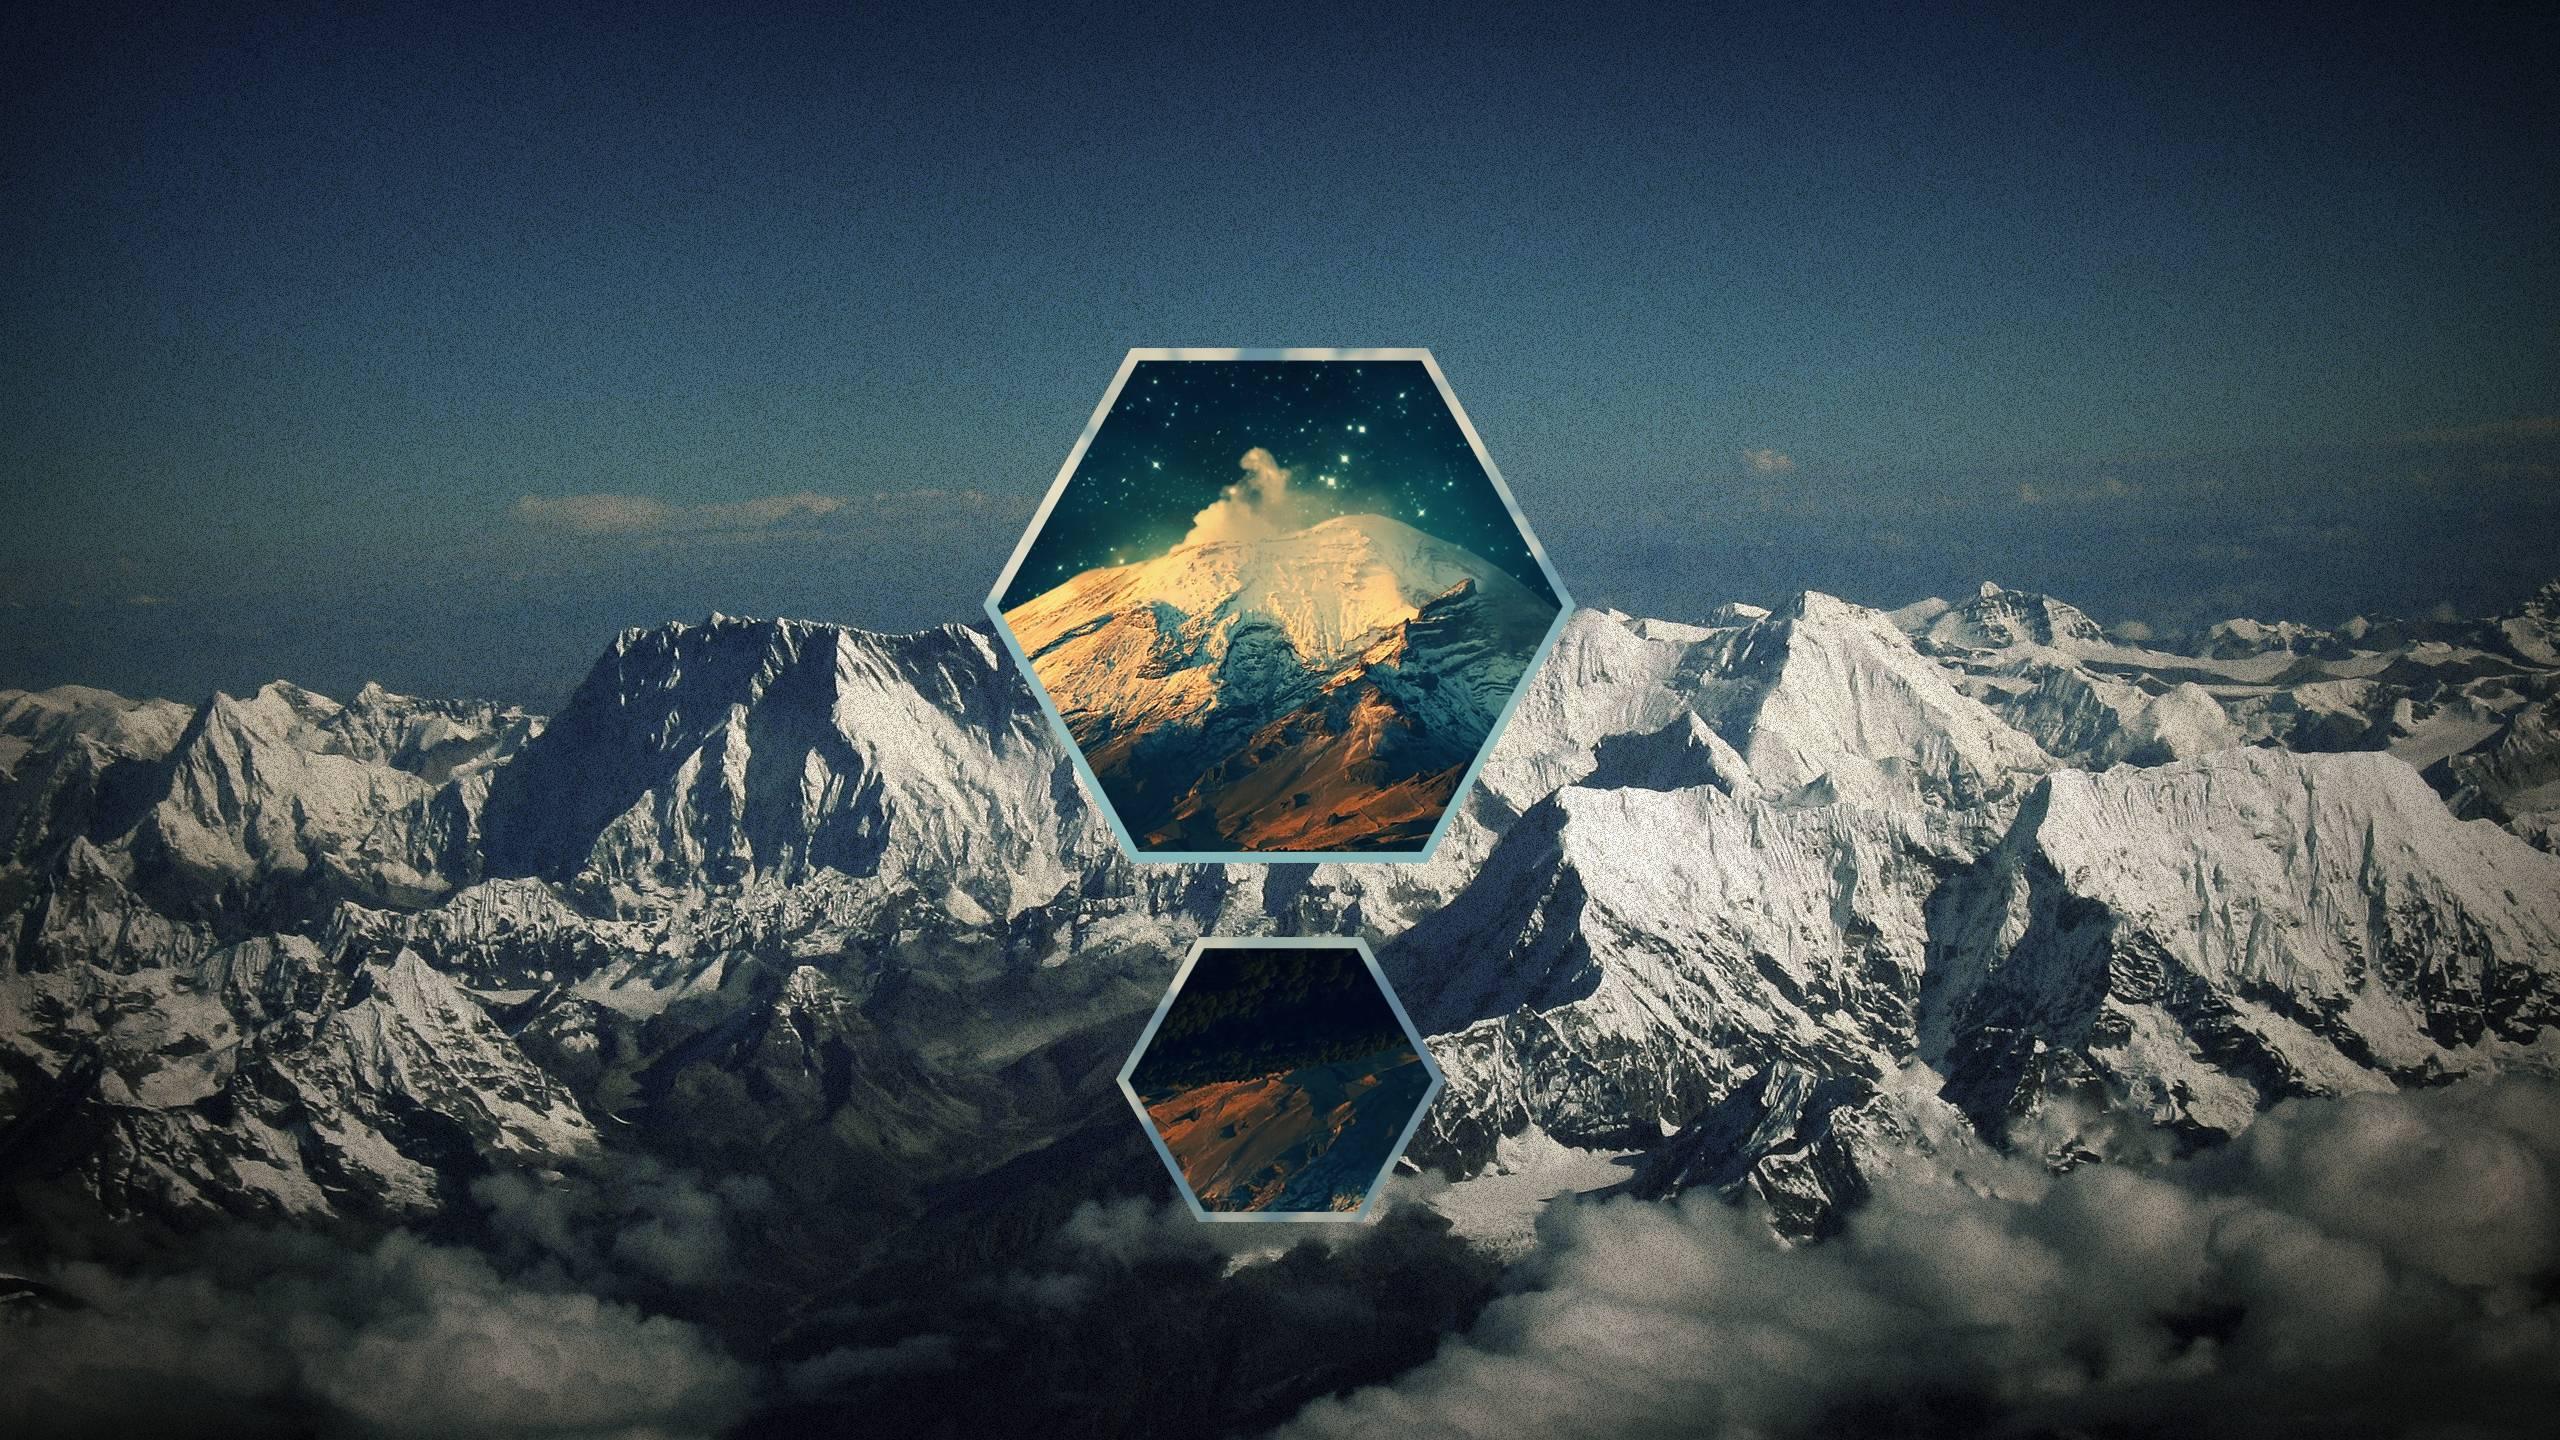 Free Download Mountain Geometry 2560x1440 Iimgurcom 2560x1440